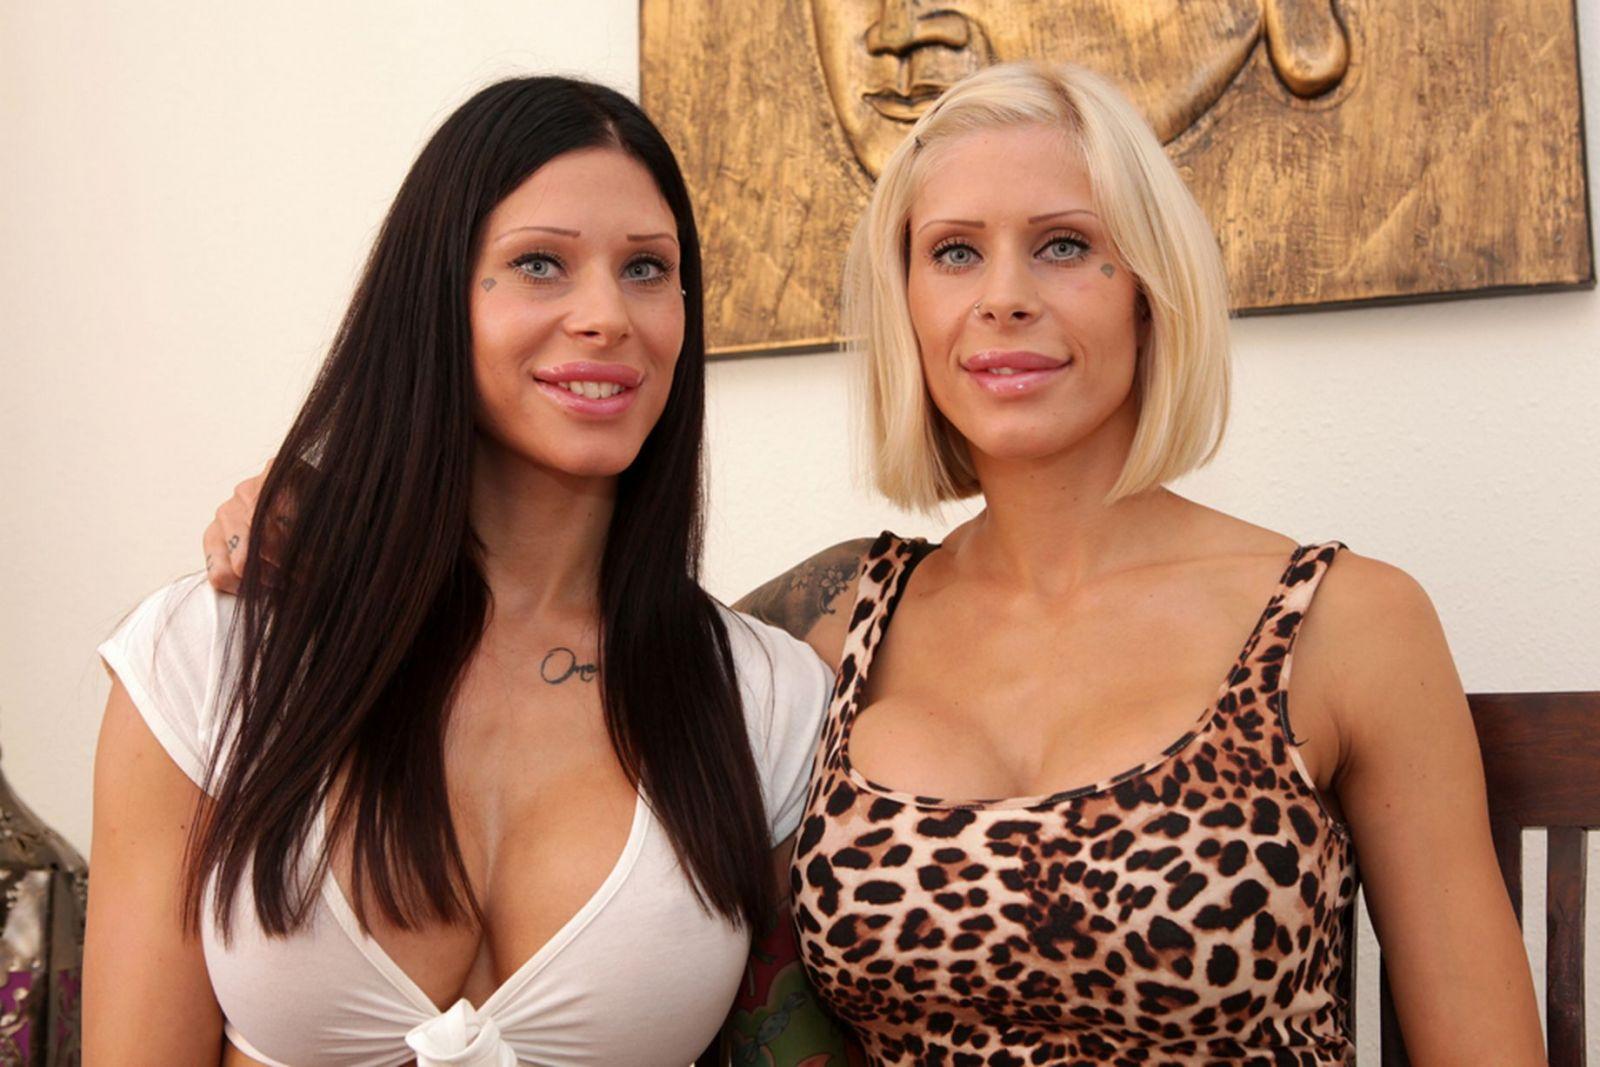 Сара и Эмма Копонен сделали пластику груди в 19 лет